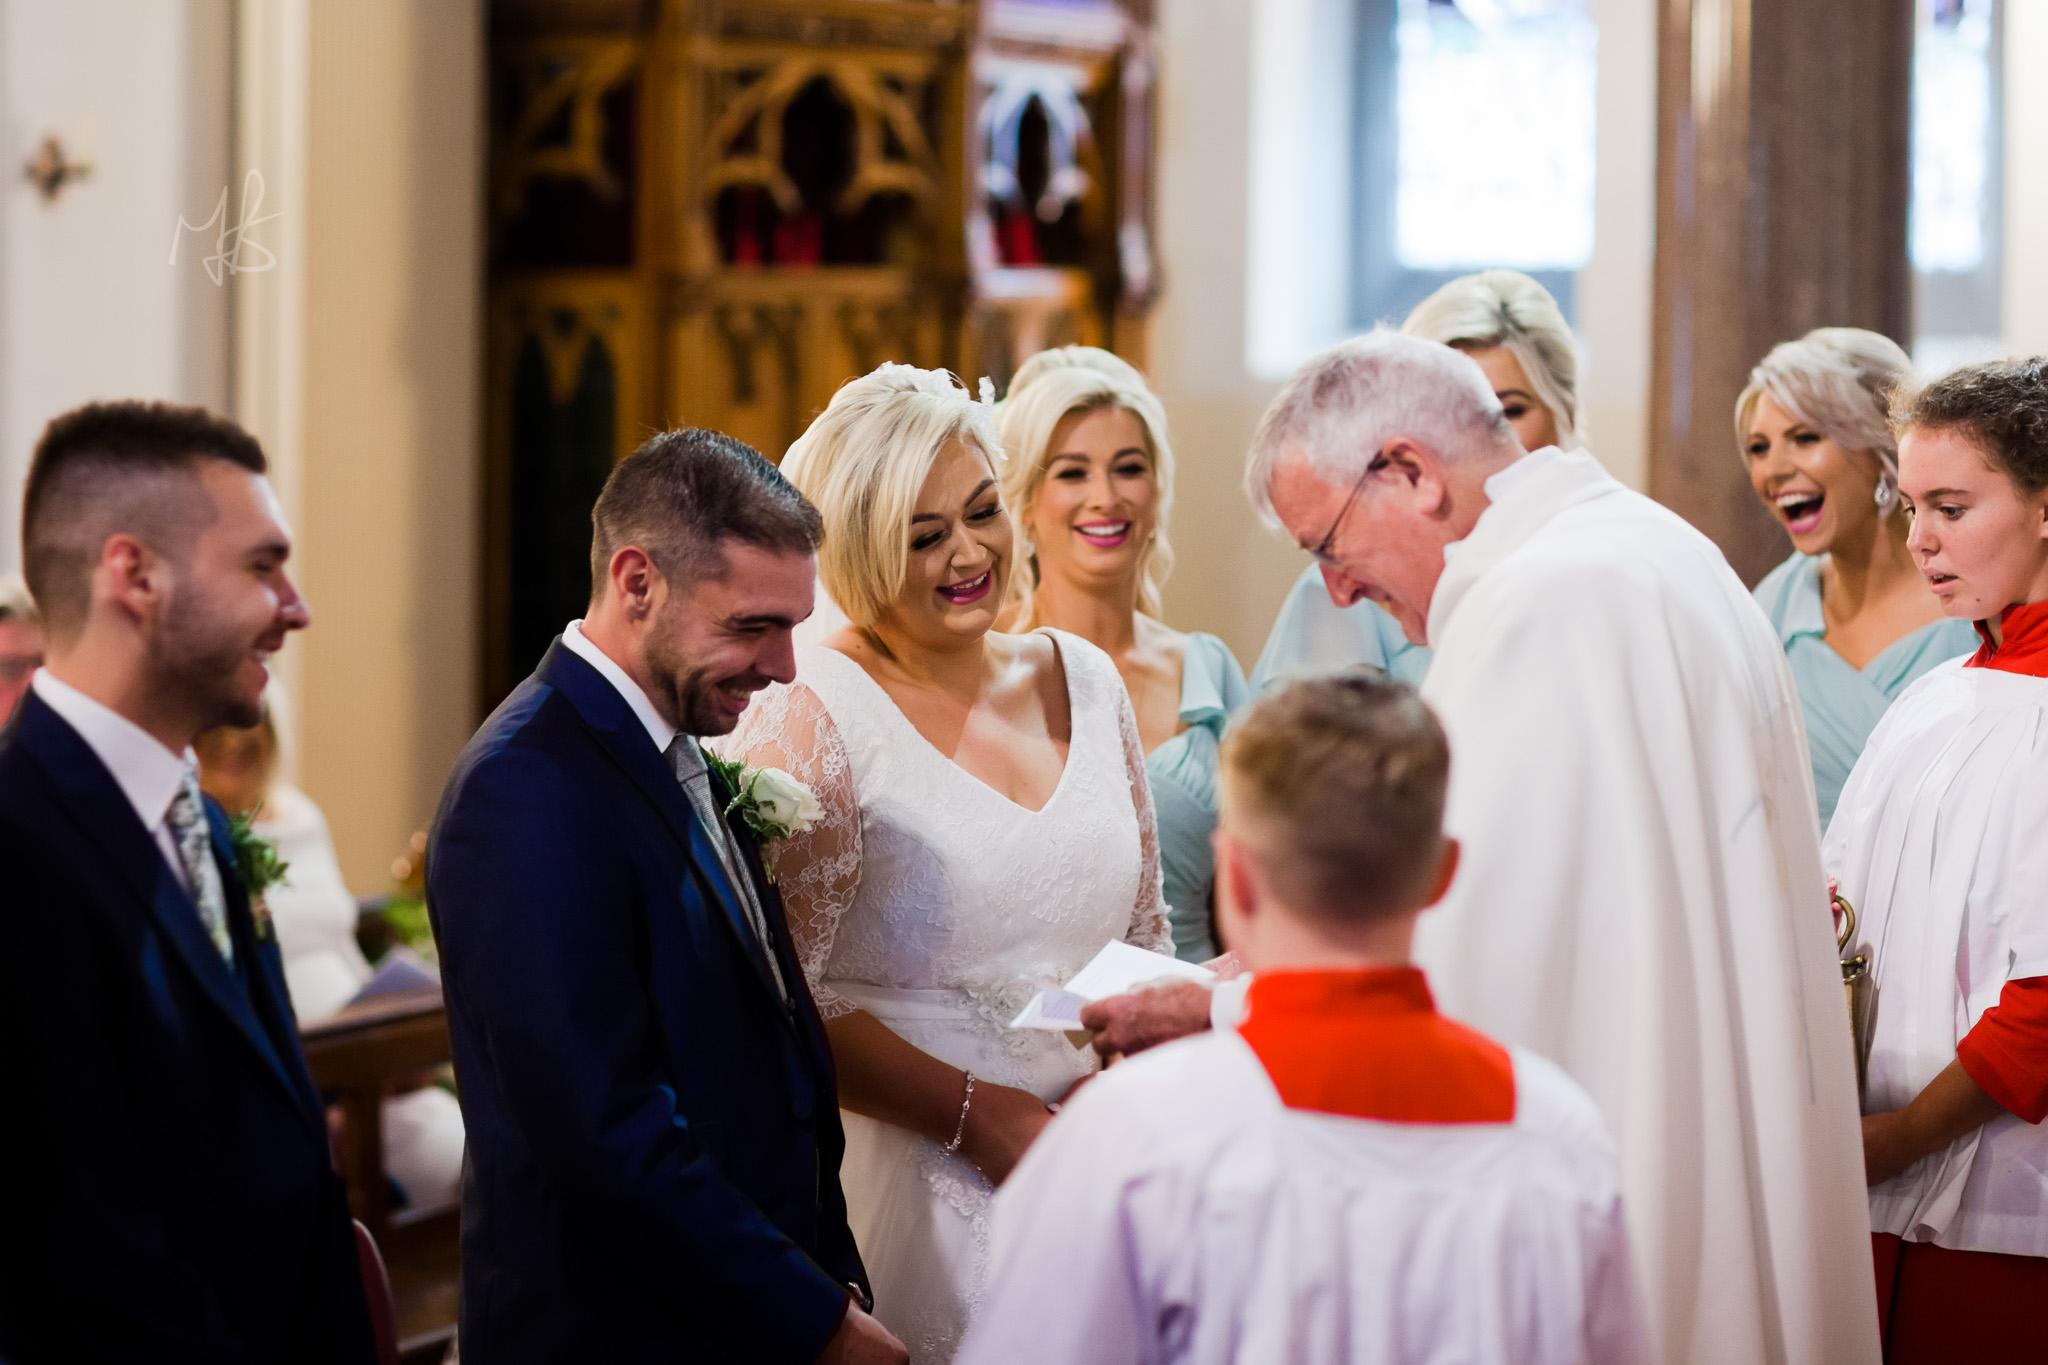 Northern-Ireland-Wedding-Photographer-Mark-Barnes-Ballymena_wedding-photography-Leighinmohr-House-Seamas_Alanna_For-web-20.jpg